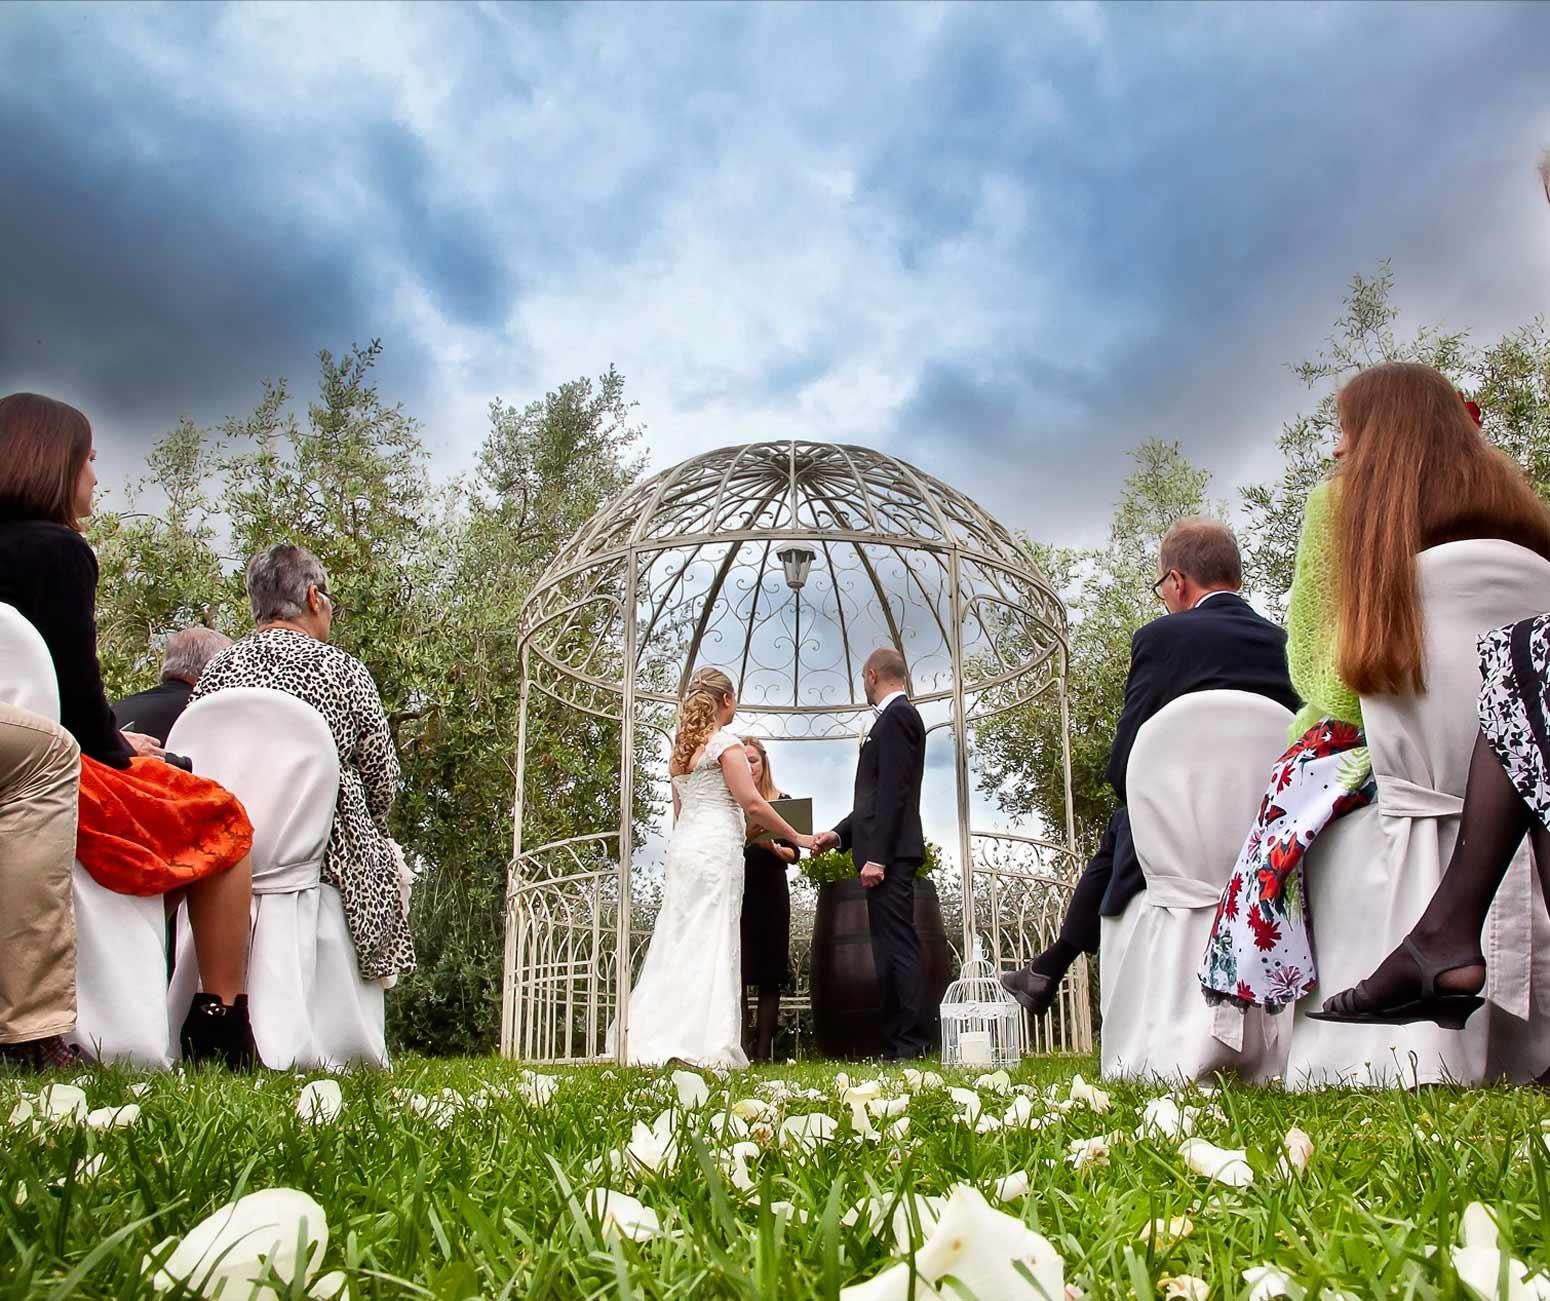 Ricevimento Matrimonio Economico Toscana : Location per matrimoni toscana ricevimento nozze